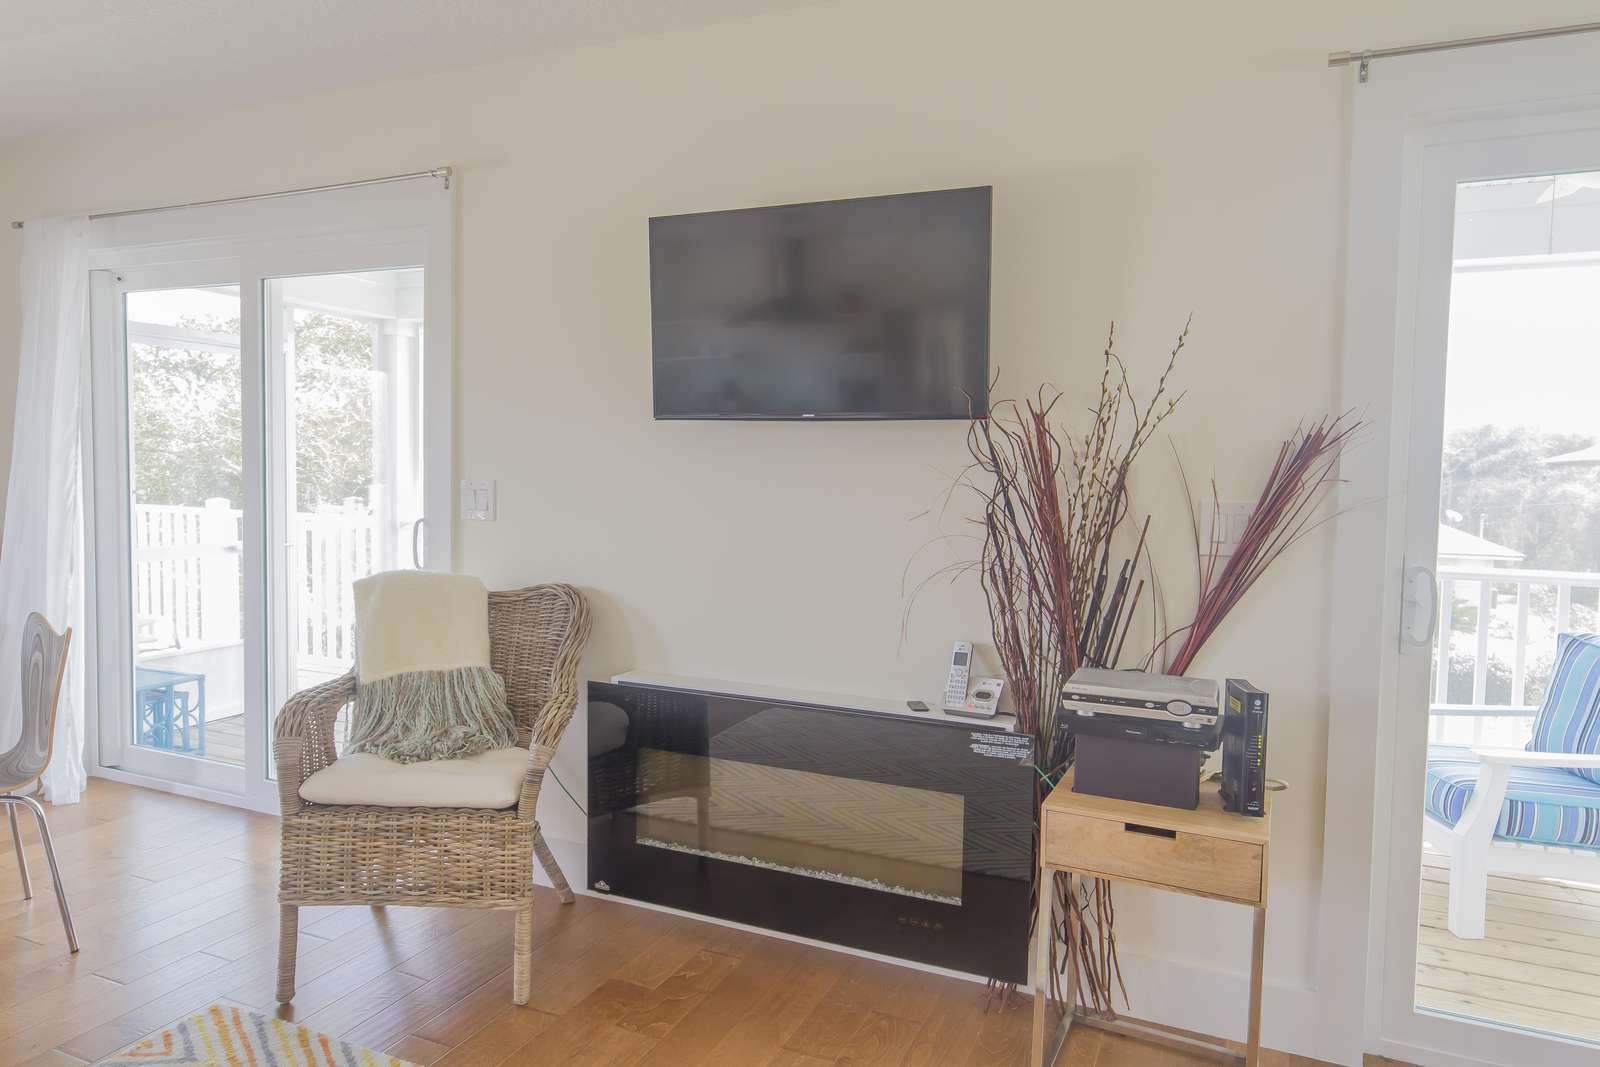 TV / Fireplace